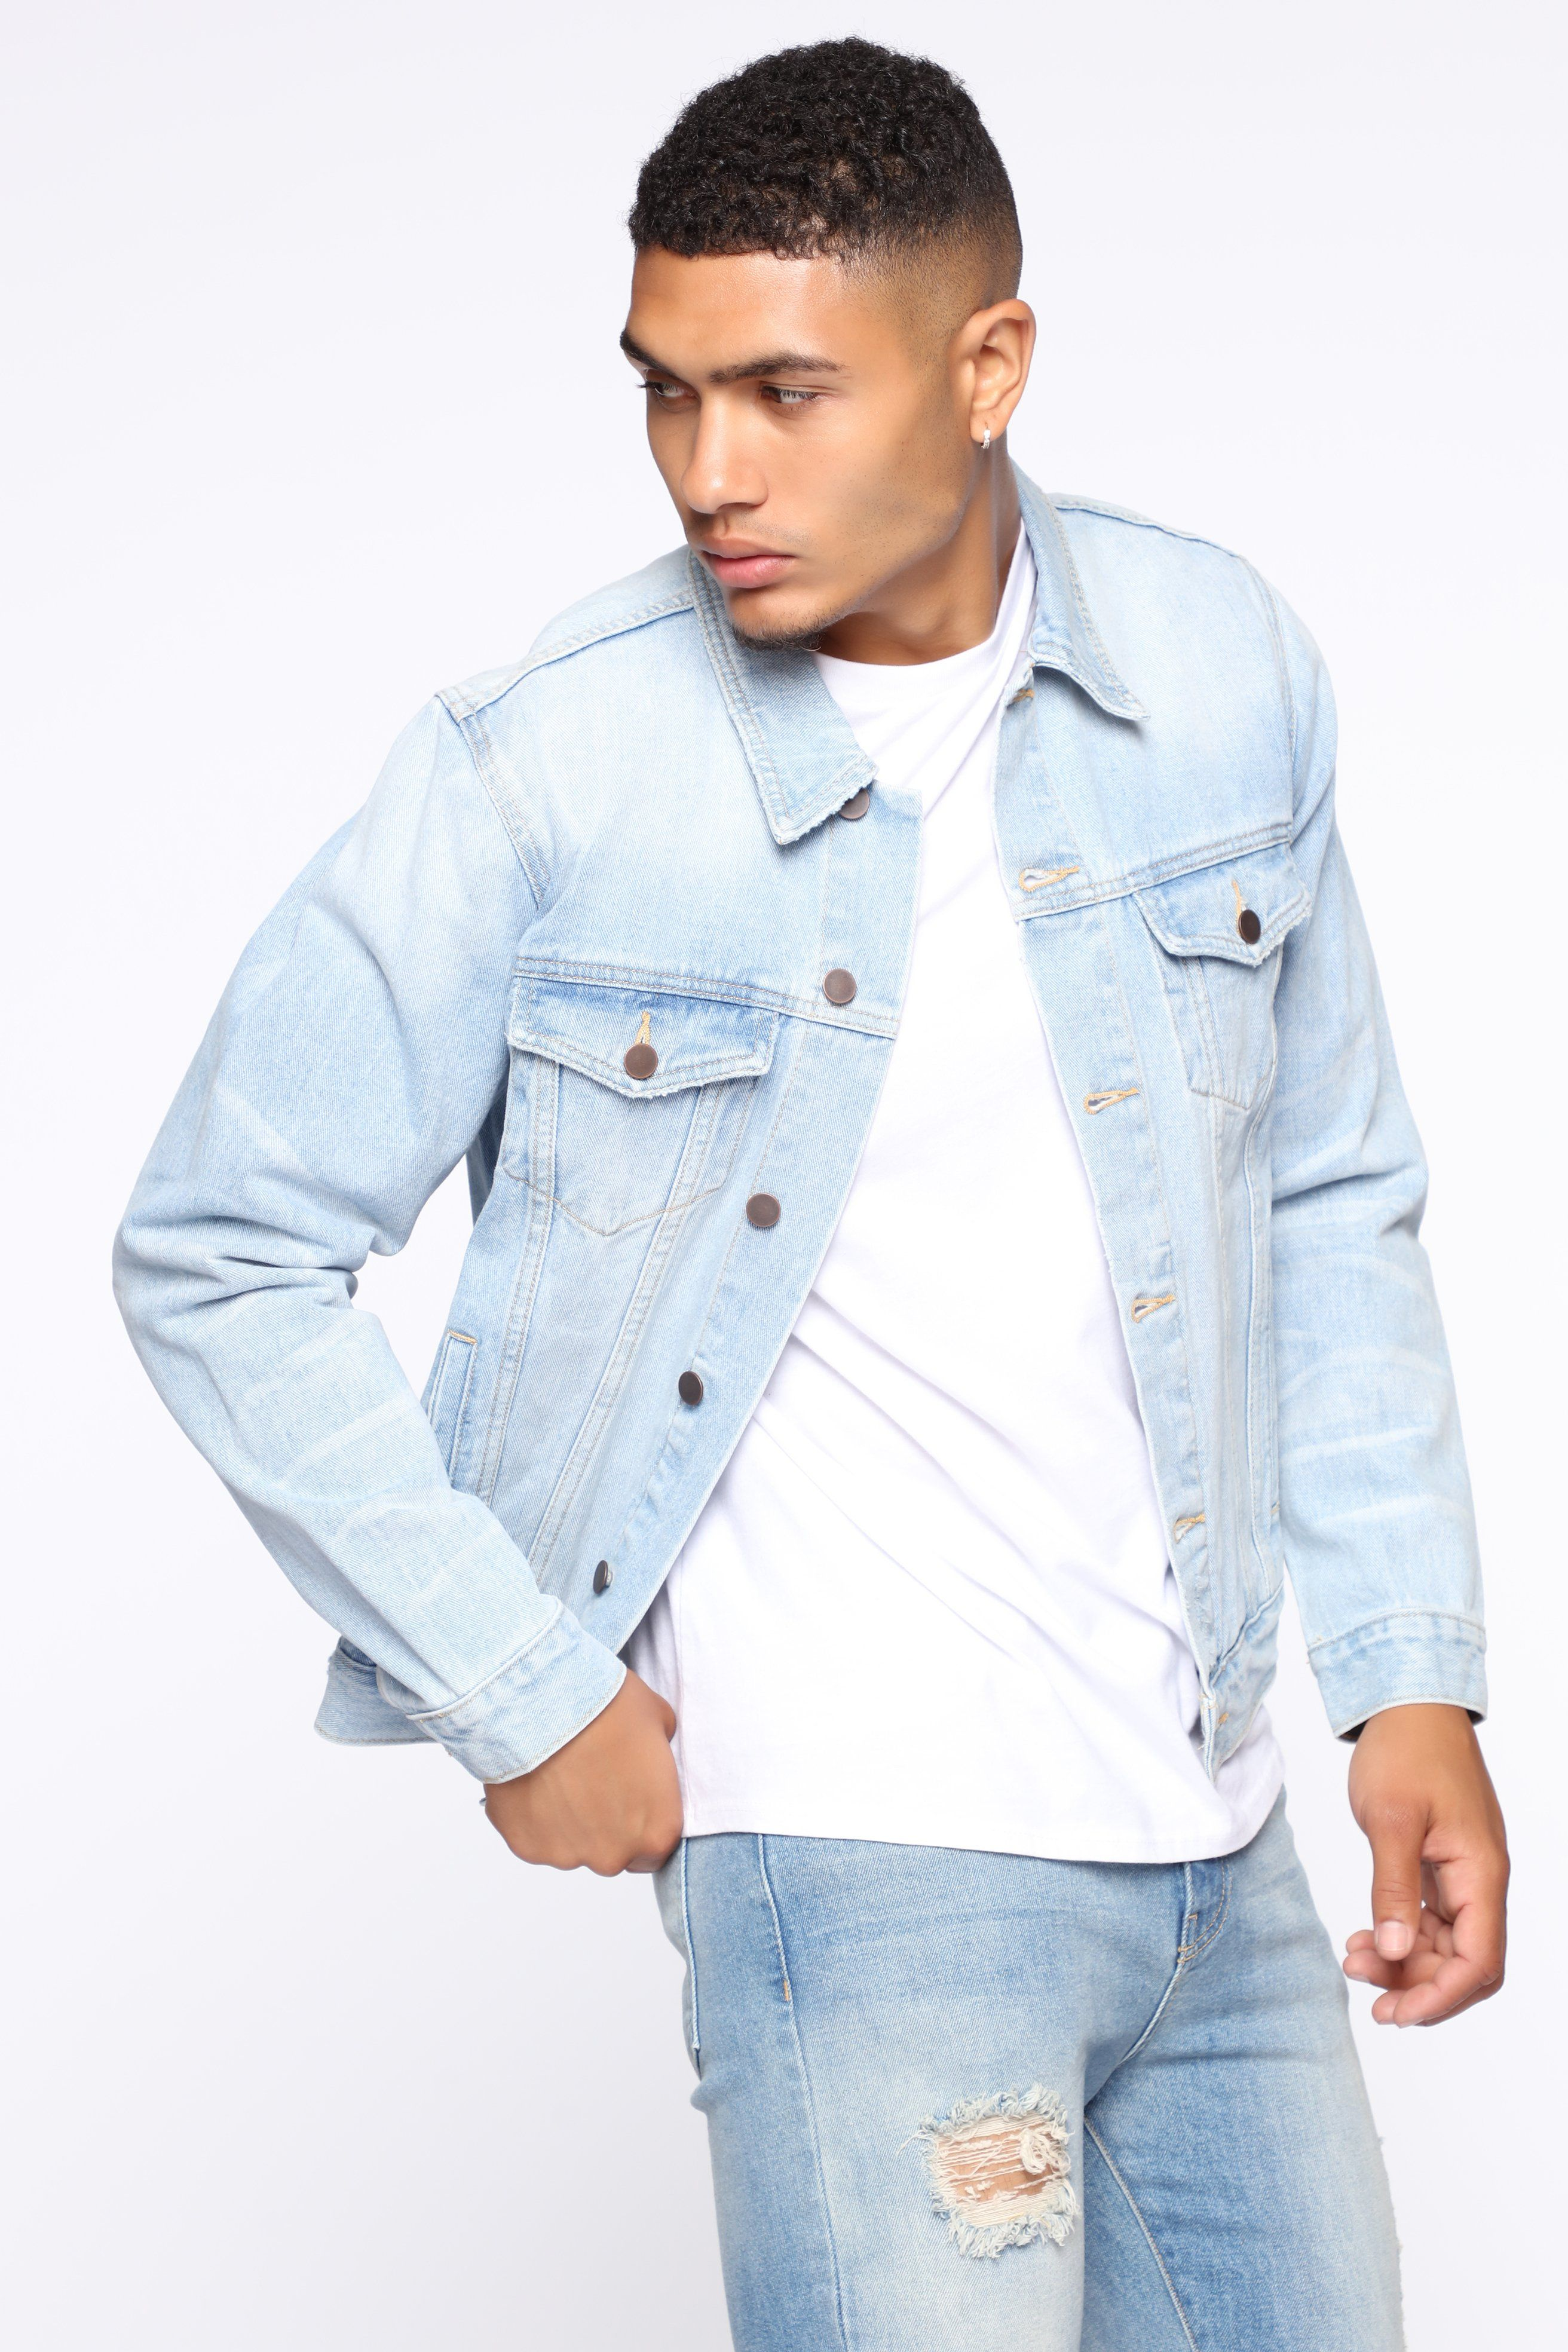 Haywood Jean Jacket Vintagebluewash In 2021 Fashion Jackets Jean Jacket Men [ 3936 x 2624 Pixel ]